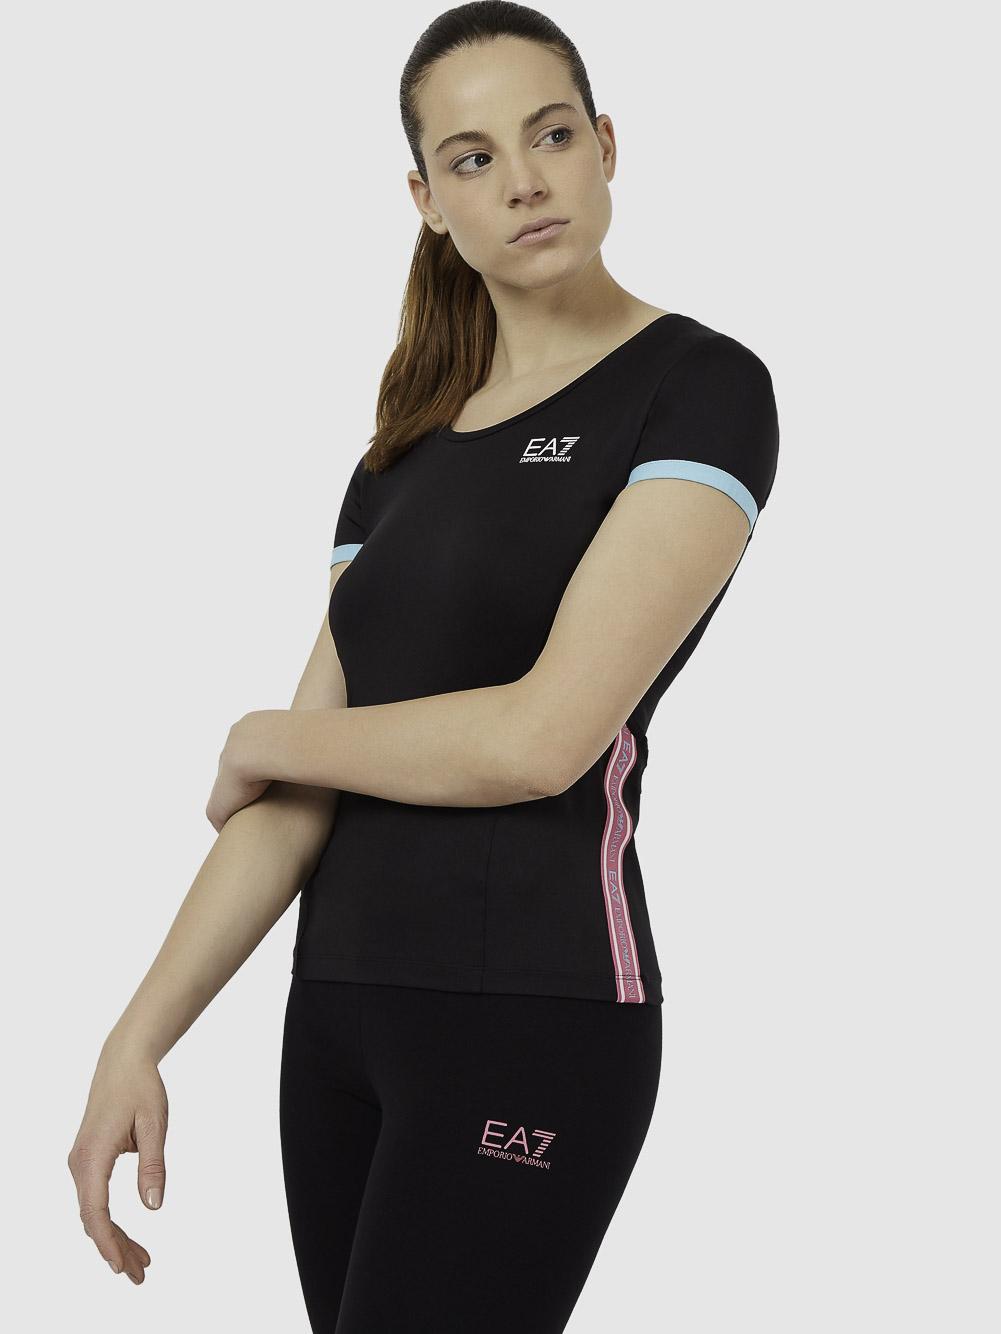 EMPORIO ARMANI Μπλούζα t-shirt 3KTT10TJ56Z-1200 ΜΑΥΡΟ